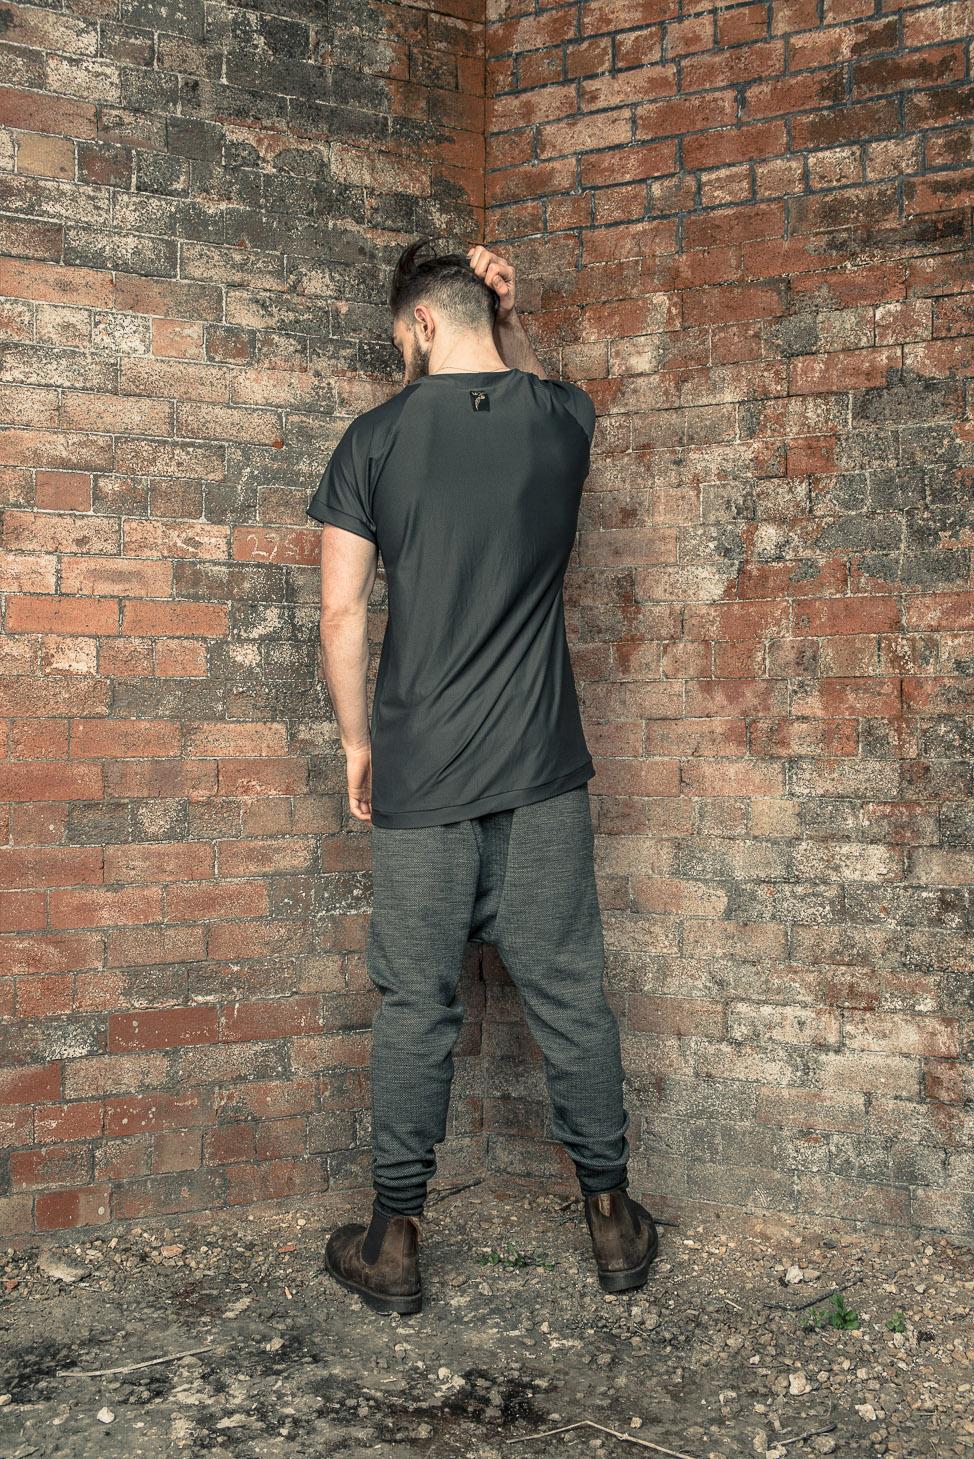 zaramia-ava-zaramiaava-leeds-fashion-designer-ethical-sustainable-tailored-minimalist-mesh-oversized-taichi-raglan-versatile-drape-grey-tshirt-top-hareem-trousers-black-grey-texture-styling--2